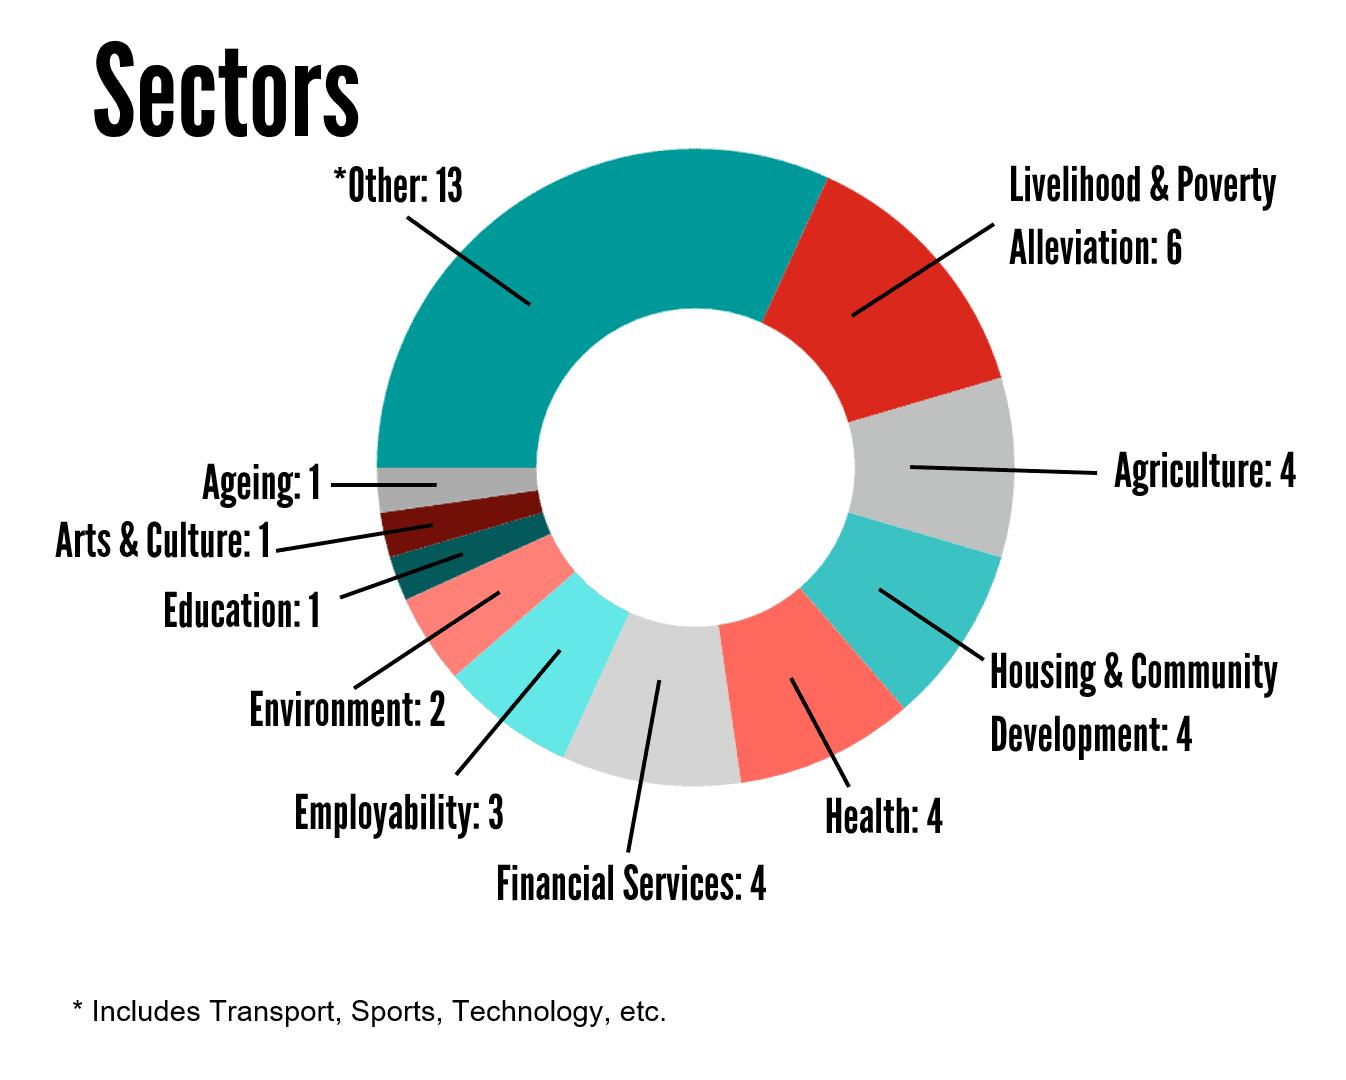 Sectors (Greyscale)